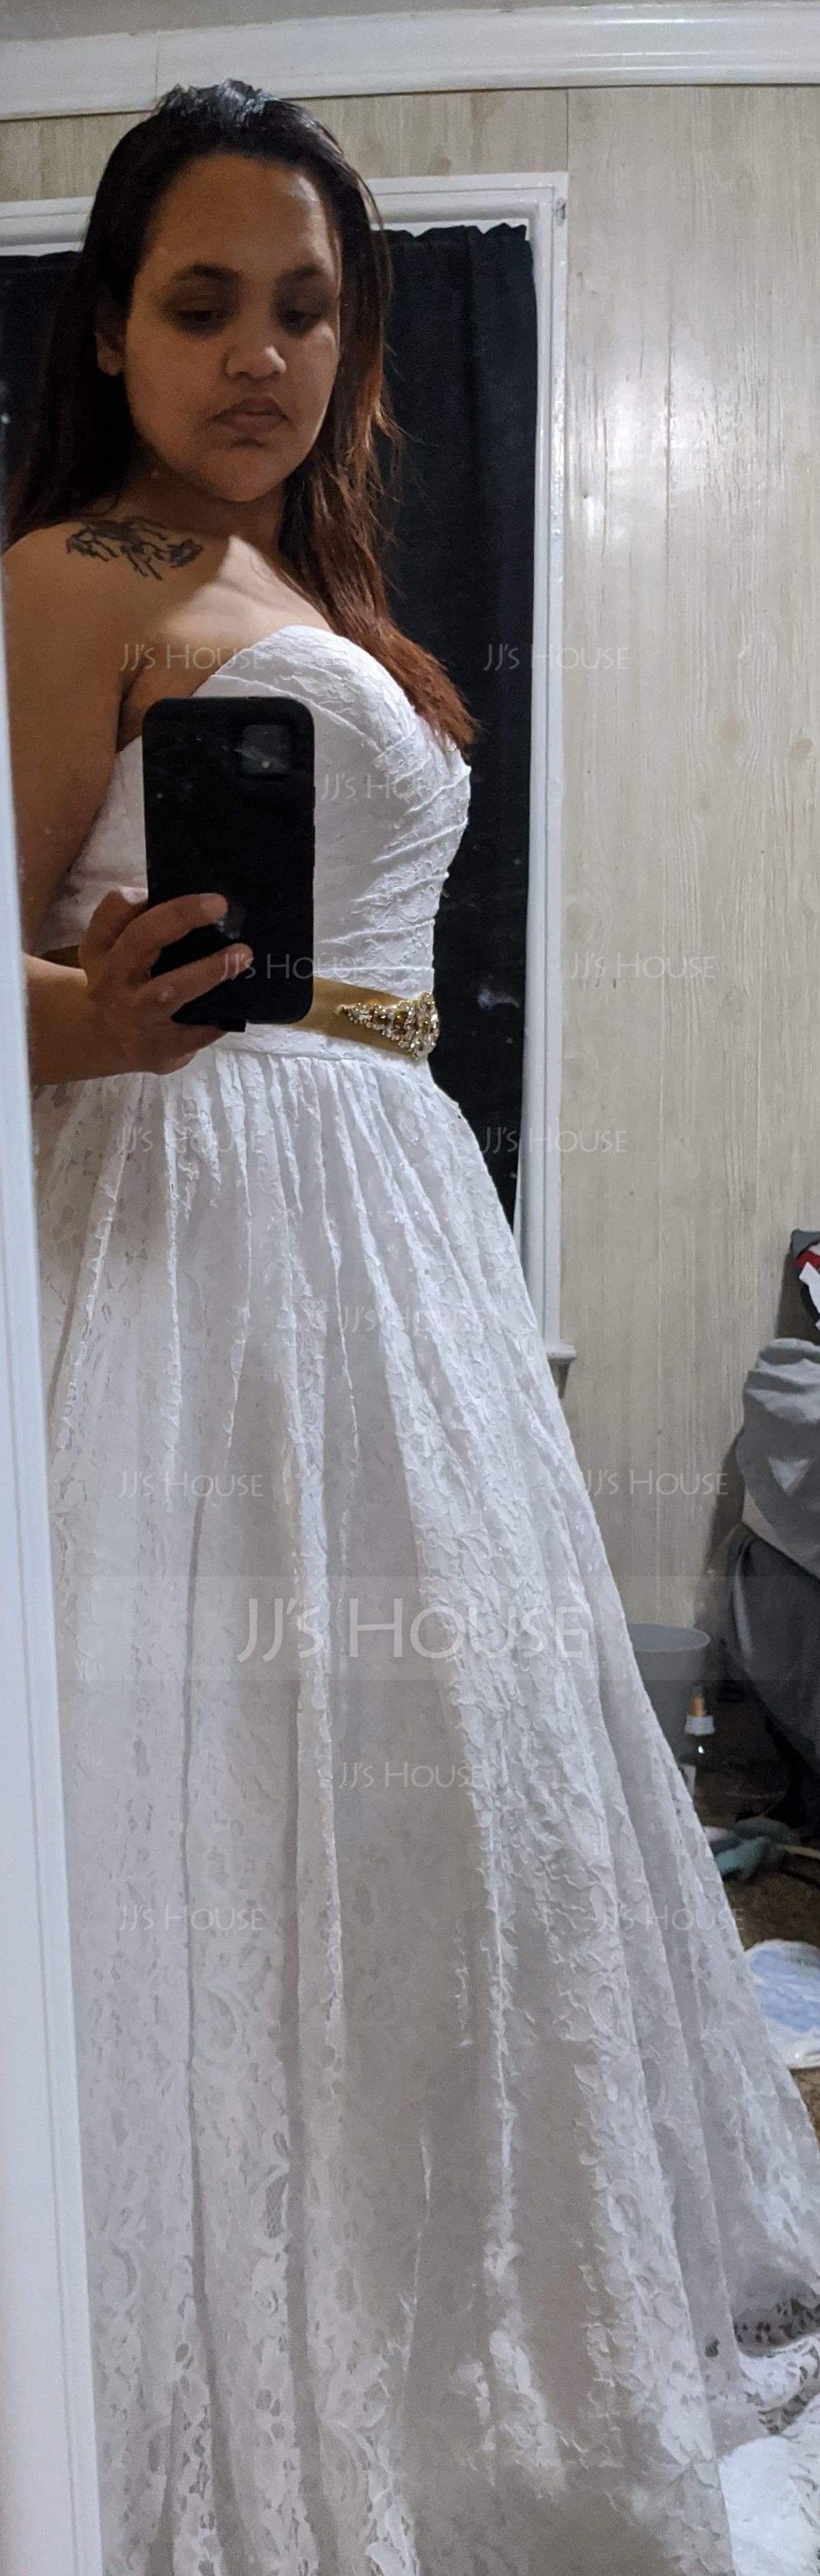 Women Tulle Netting/Taffeta Floor-length 3 Tiers Petticoats (037031009)